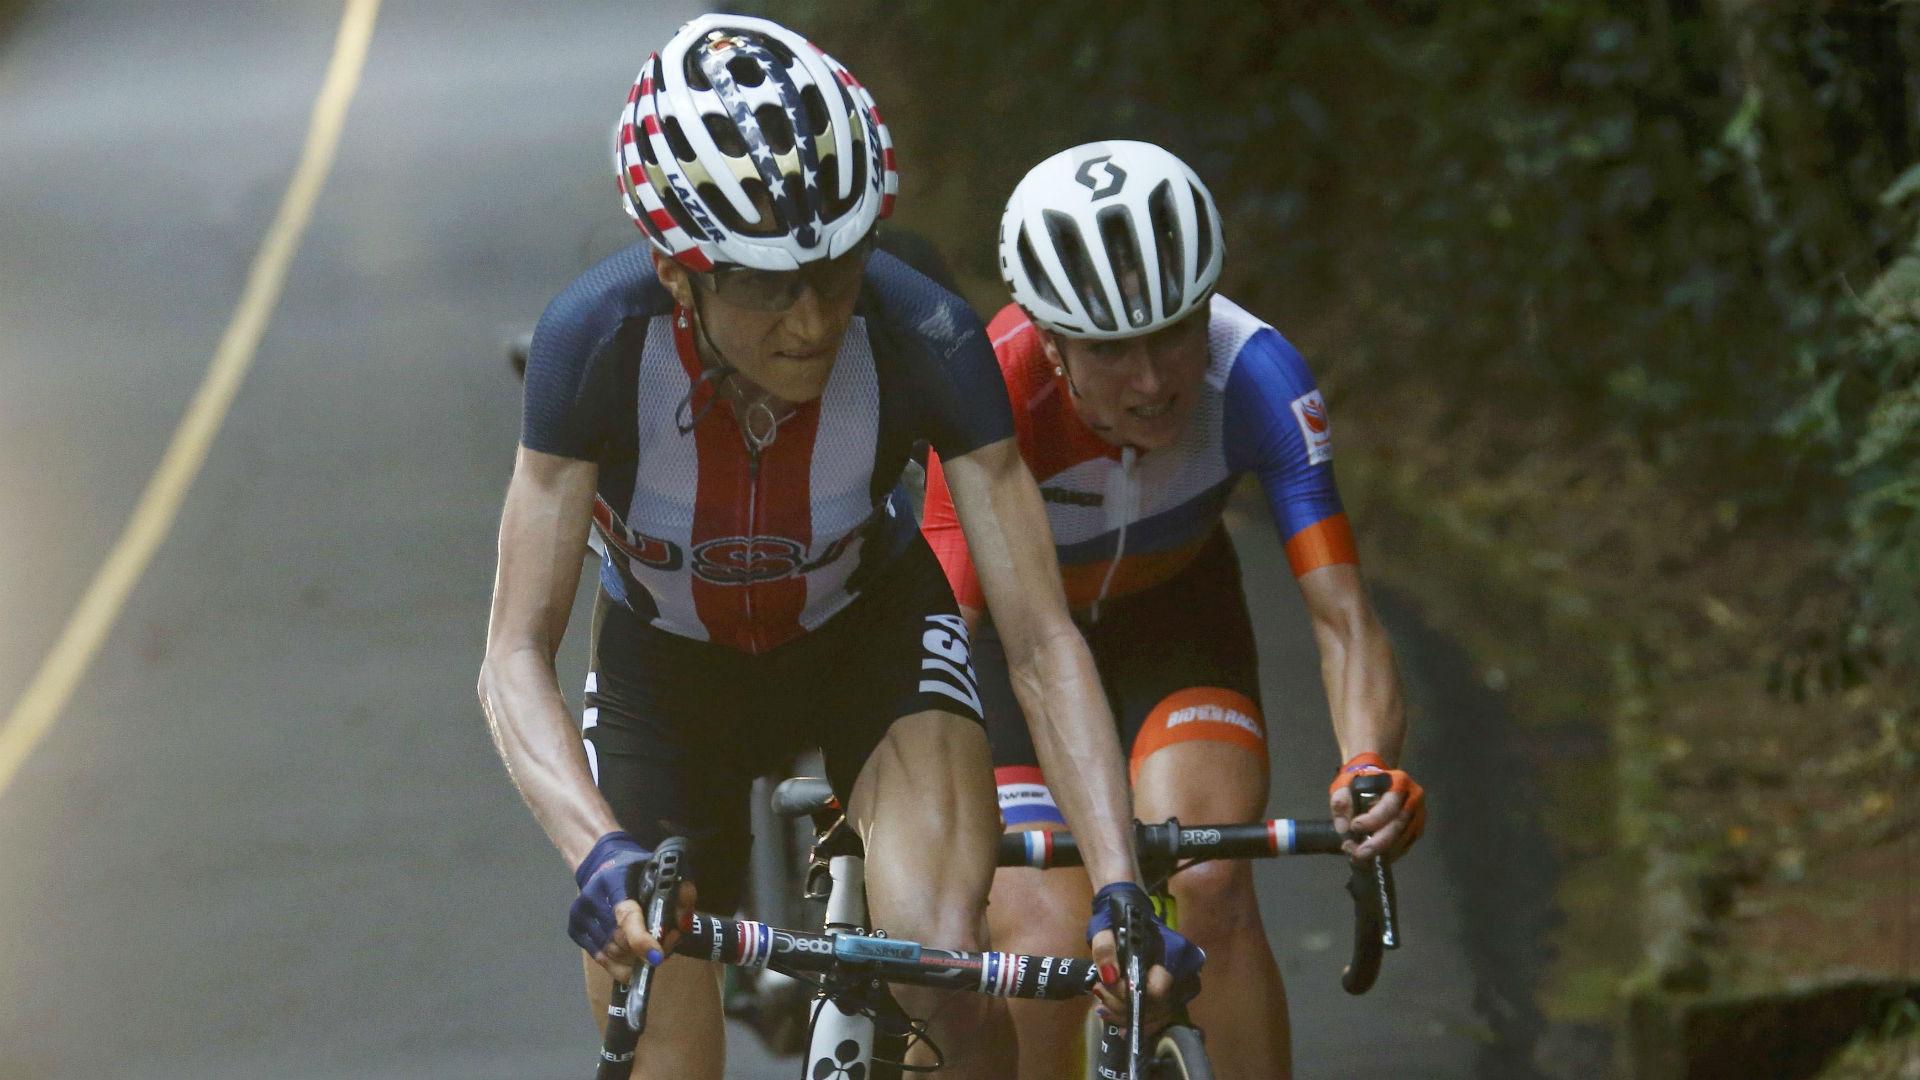 Cyclist Annemiek Van Vleuten Crashes During Olympic Race